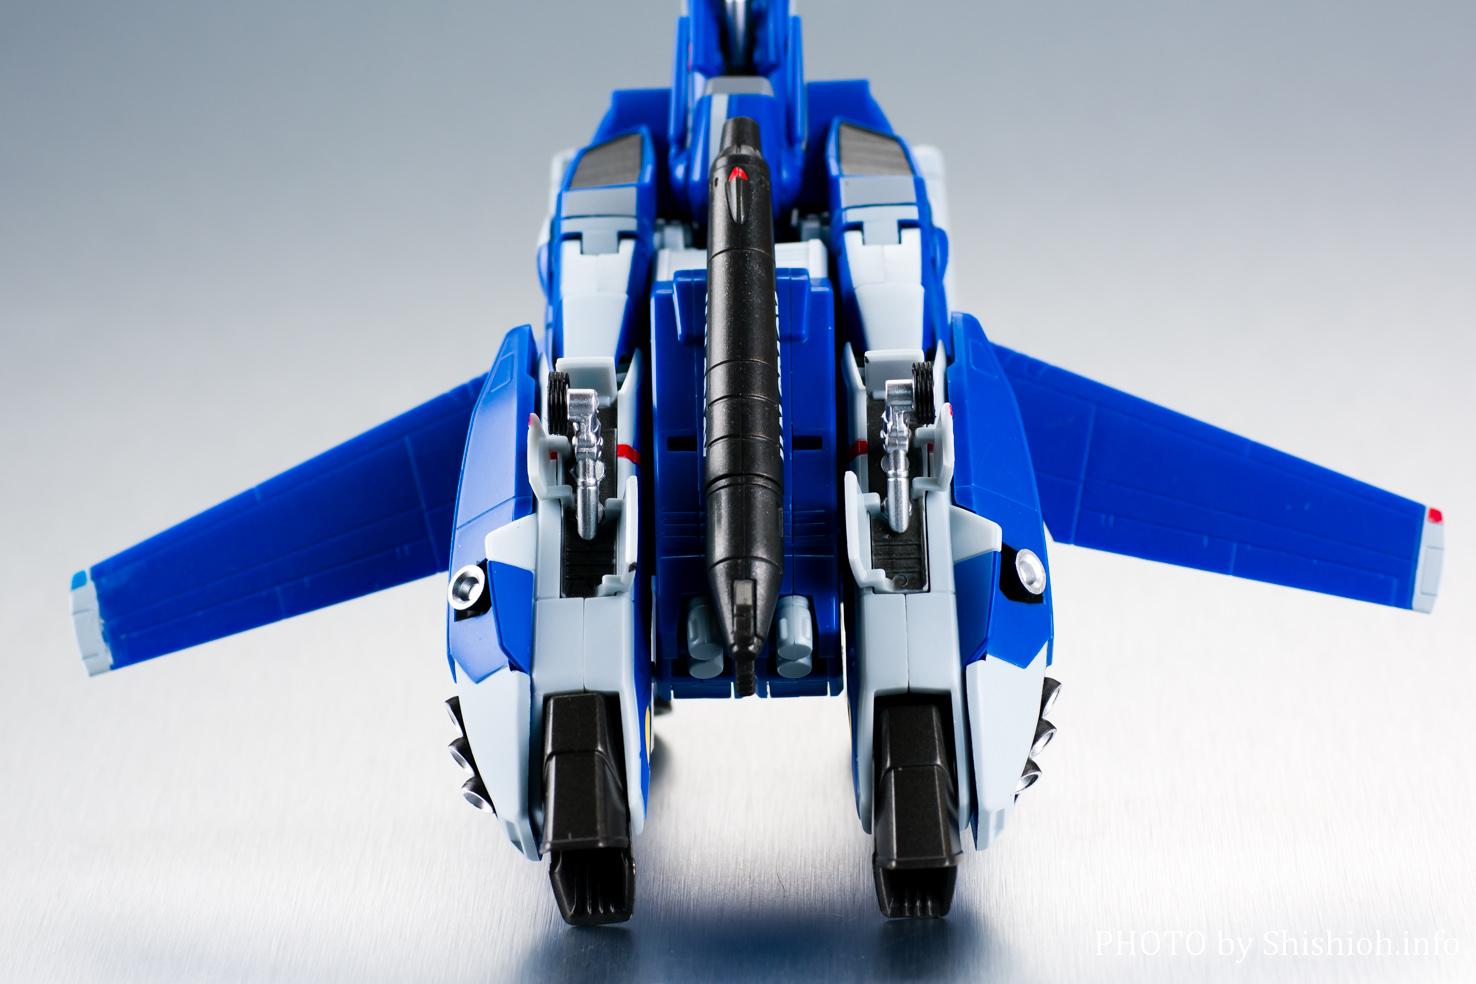 HI-METAL R VF-1J スーパーバルキリー(マクシミリアン・ジーナス機)パート2